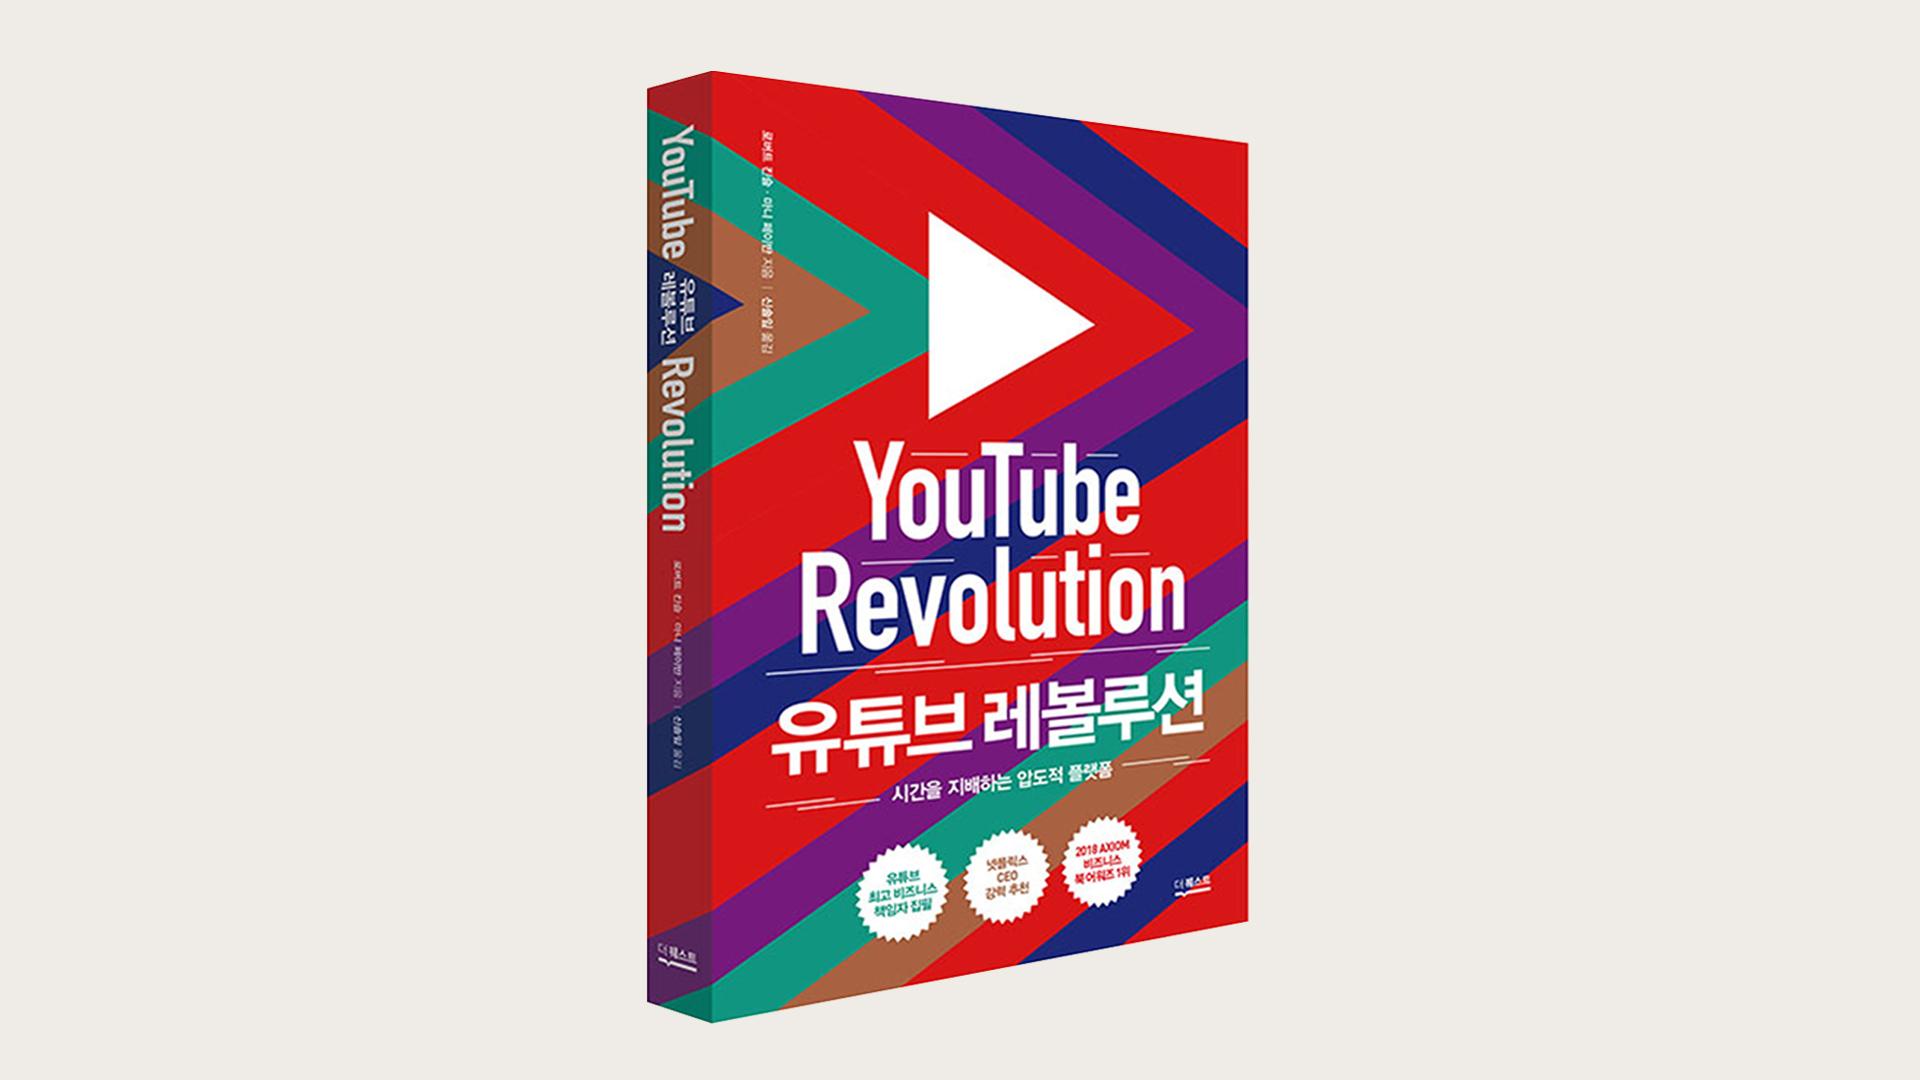 WDX_YouTubeRevo_RobertKyncl_Thumbnail.jpg